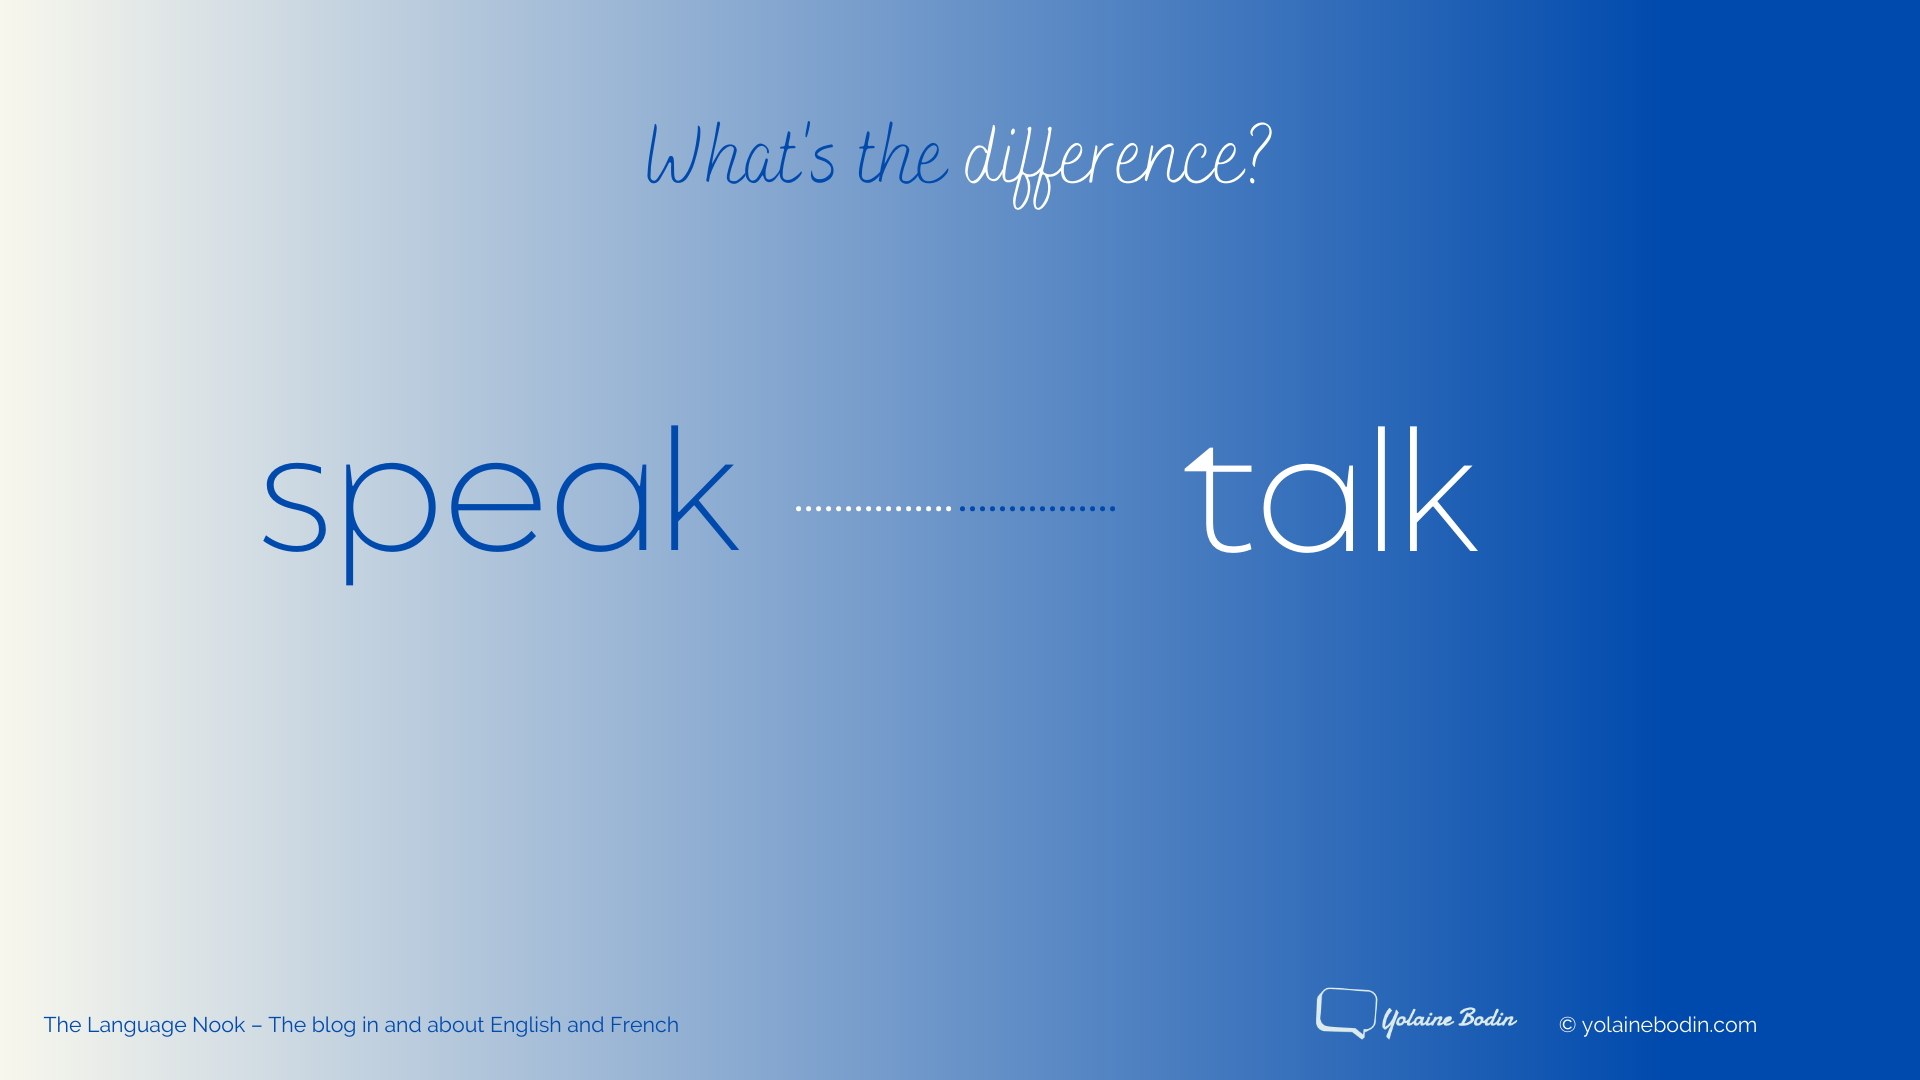 Speak or talk - Illustration by Yolaine Bodin